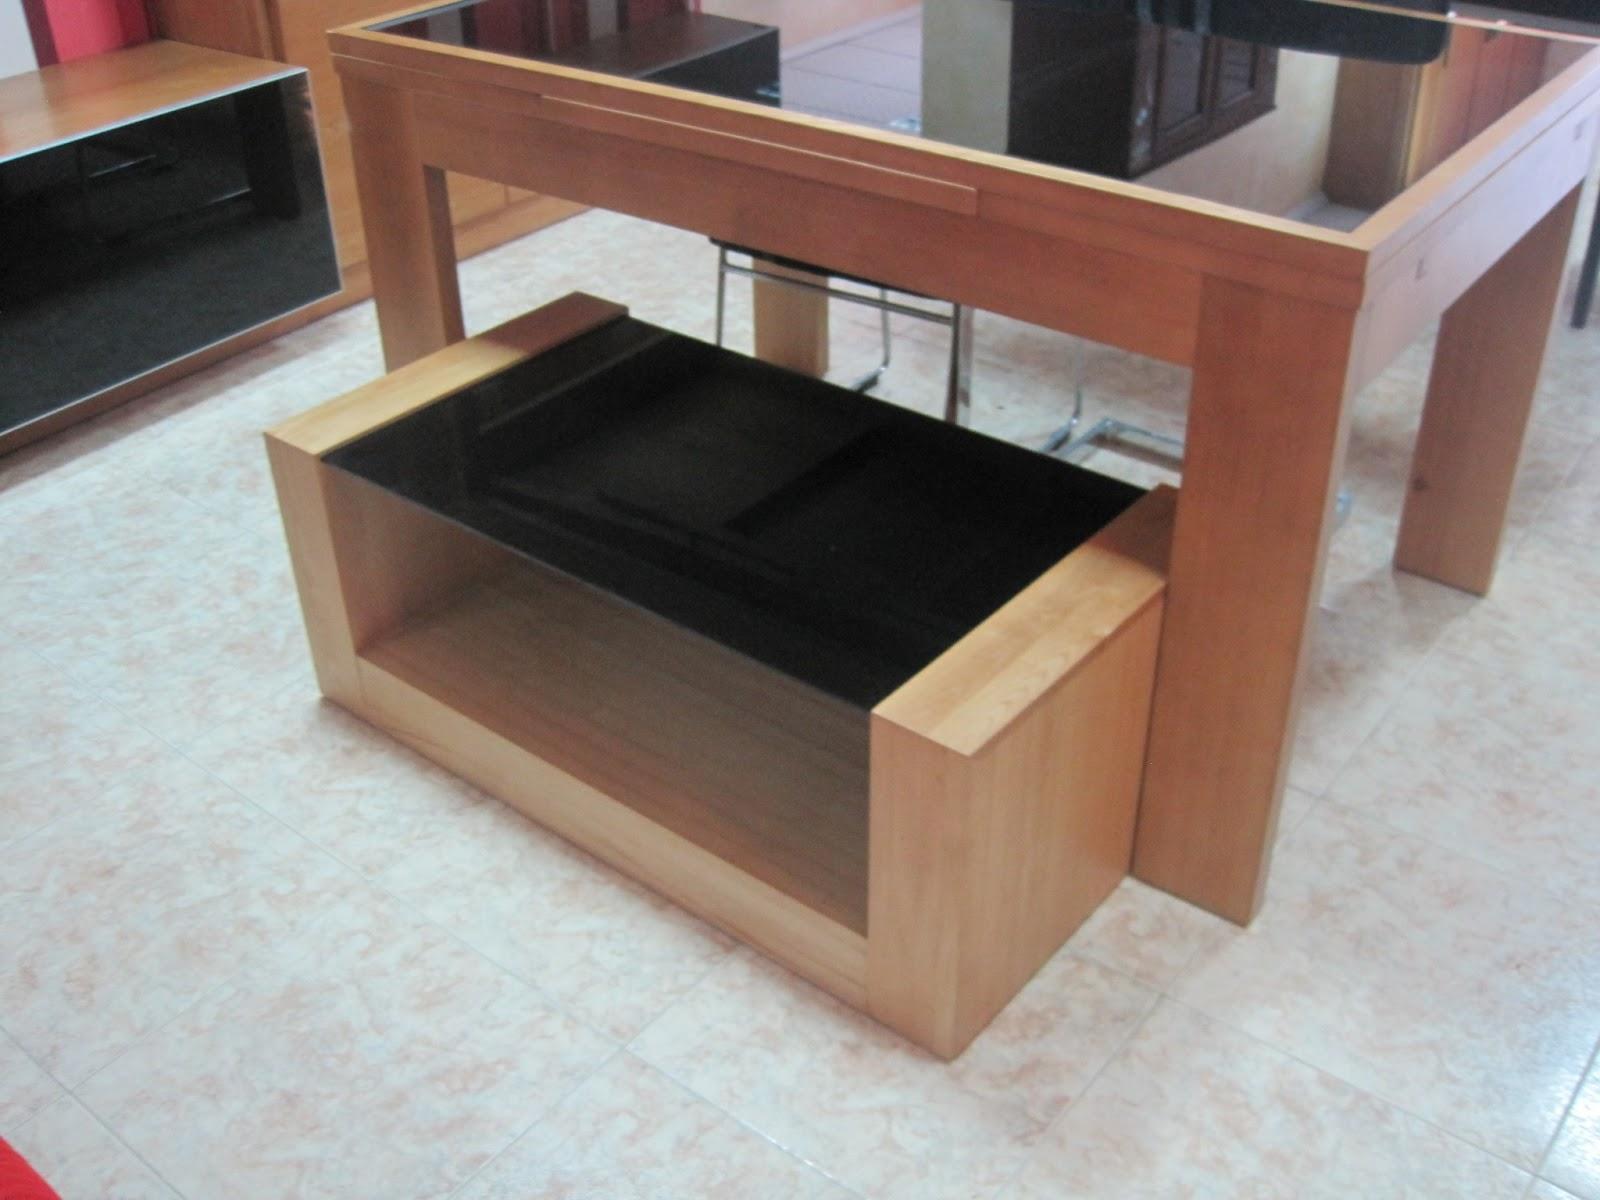 Fotos de muebles de comedor de madera for Imagenes muebles comedor